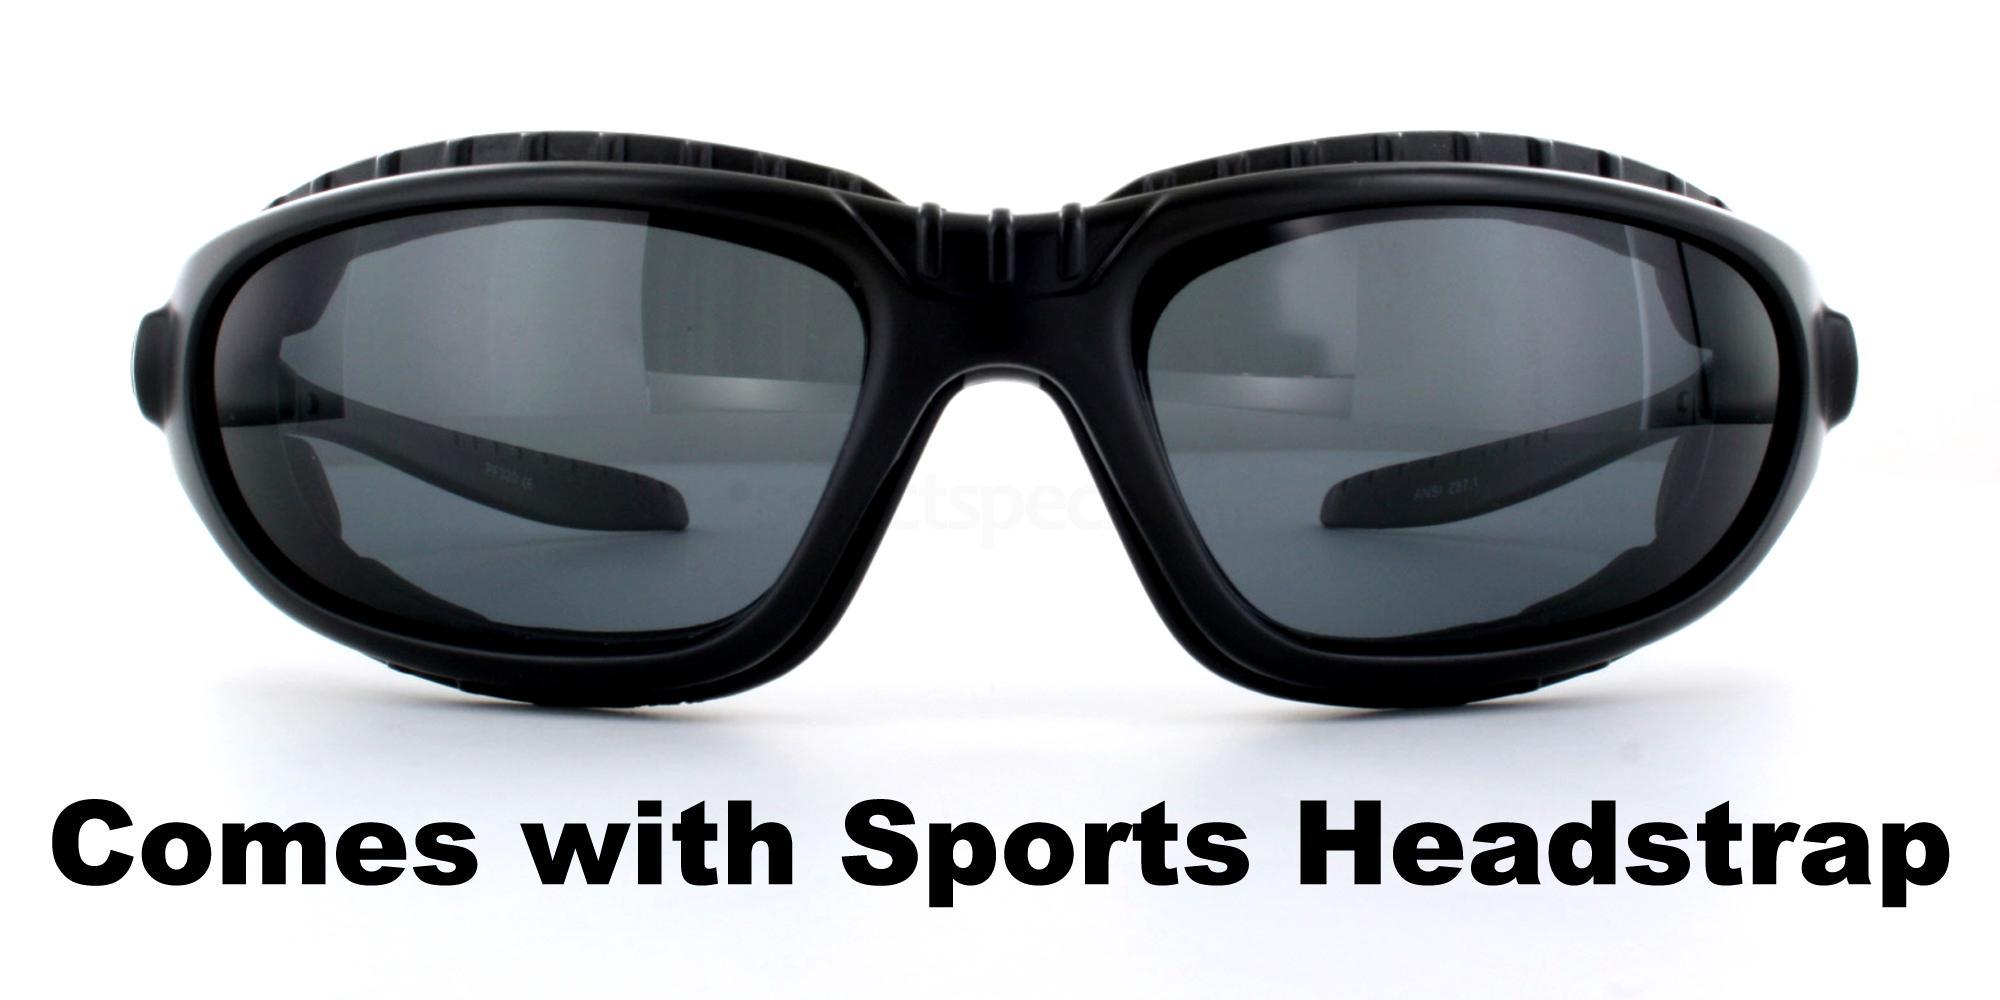 Matte Black + Grey Lens + Headstrap PF320 Sunglasses, Aero